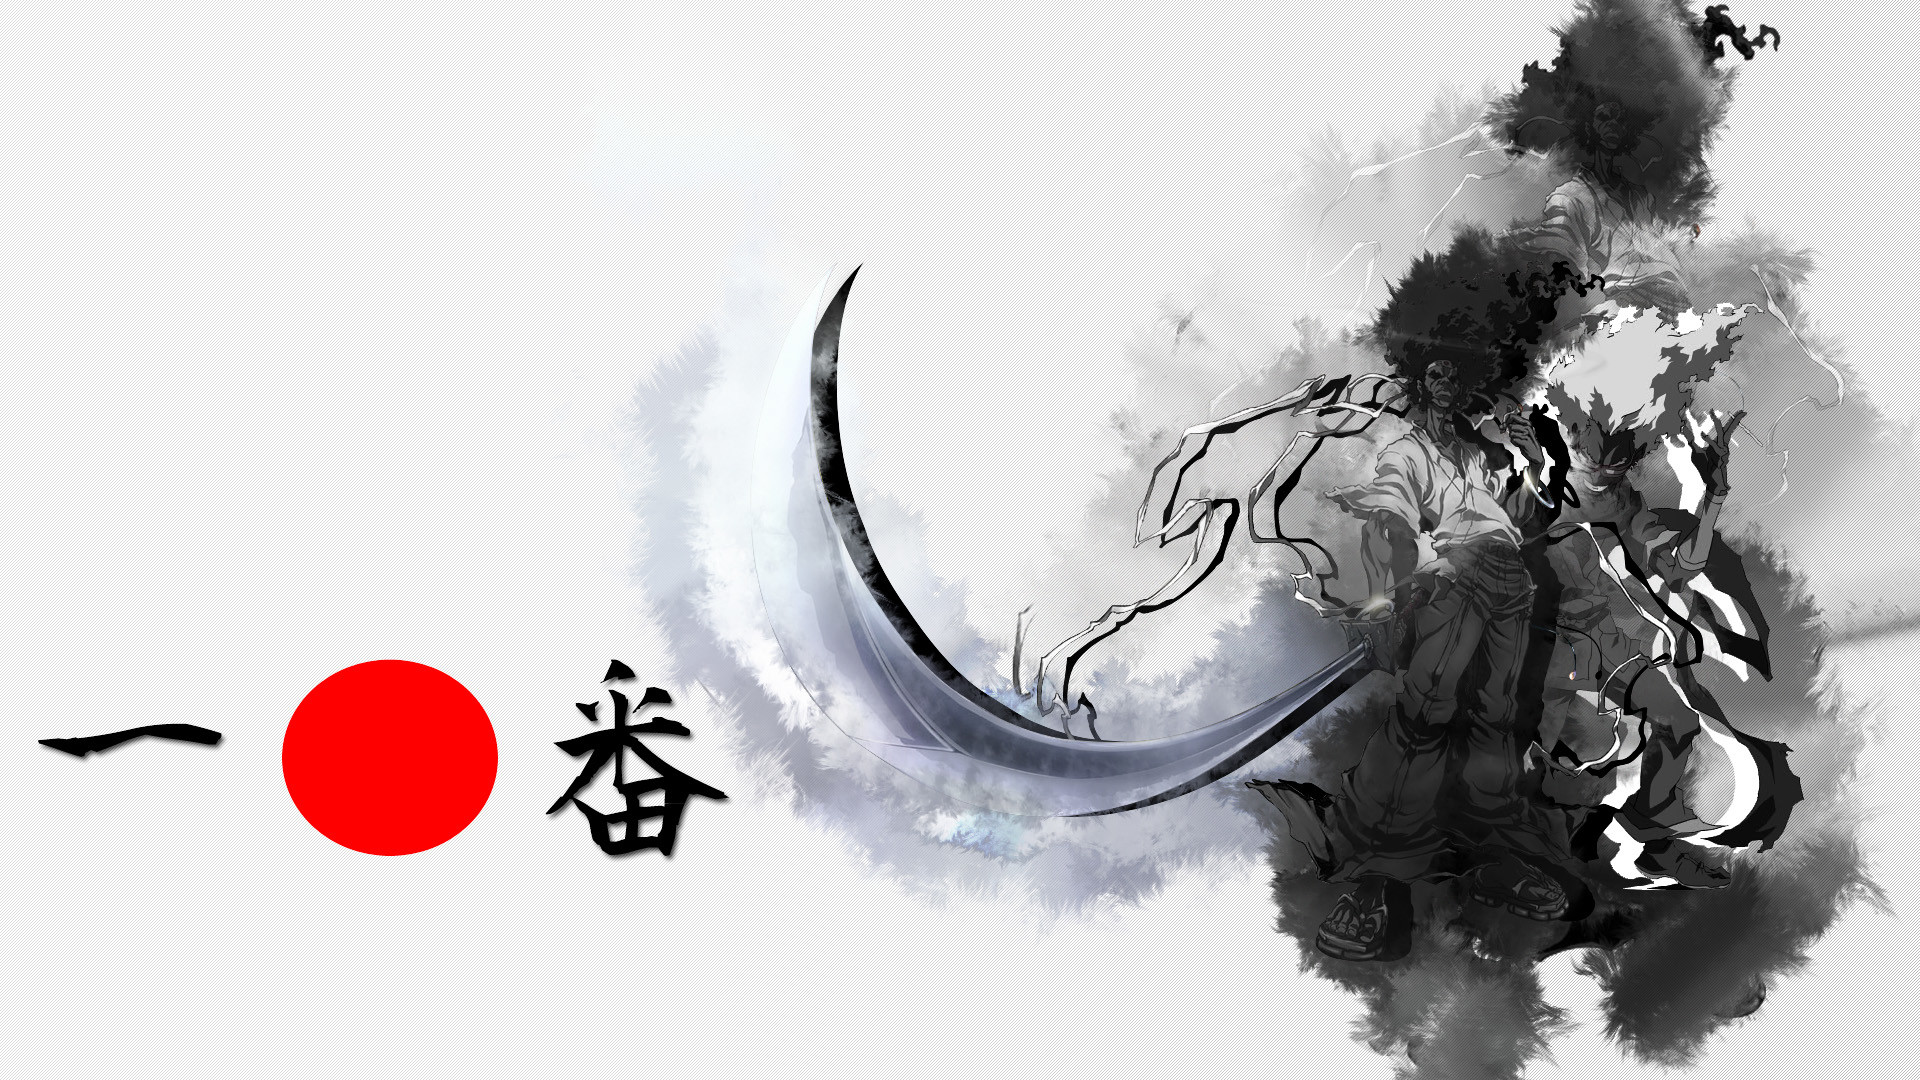 Afro Samurai anime game f wallpaper | | 91855 | WallpaperUP